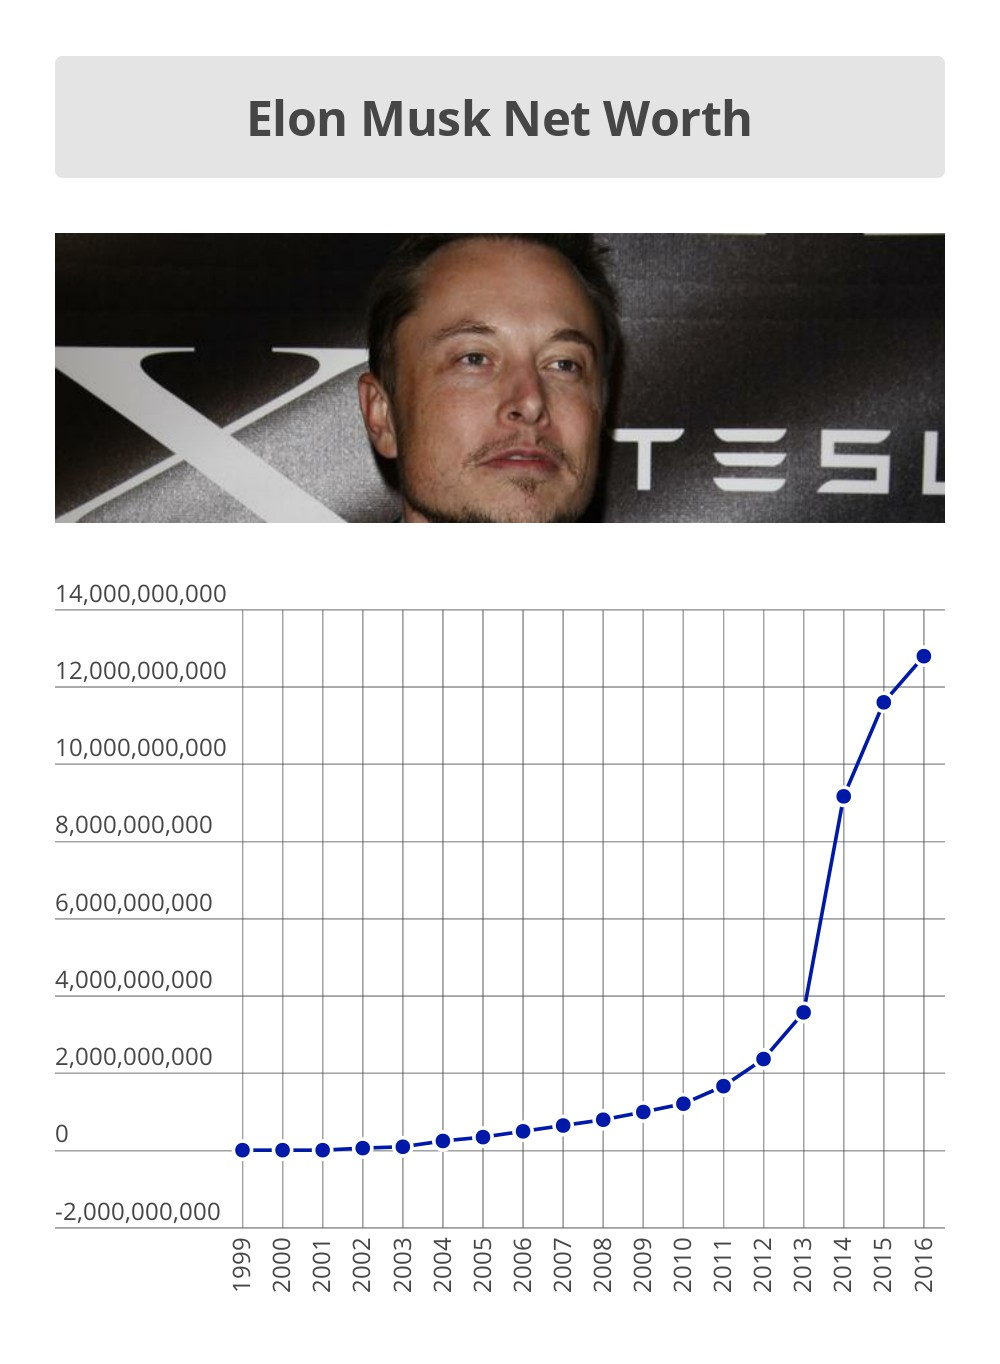 Elon Musk Net Worth Timeline